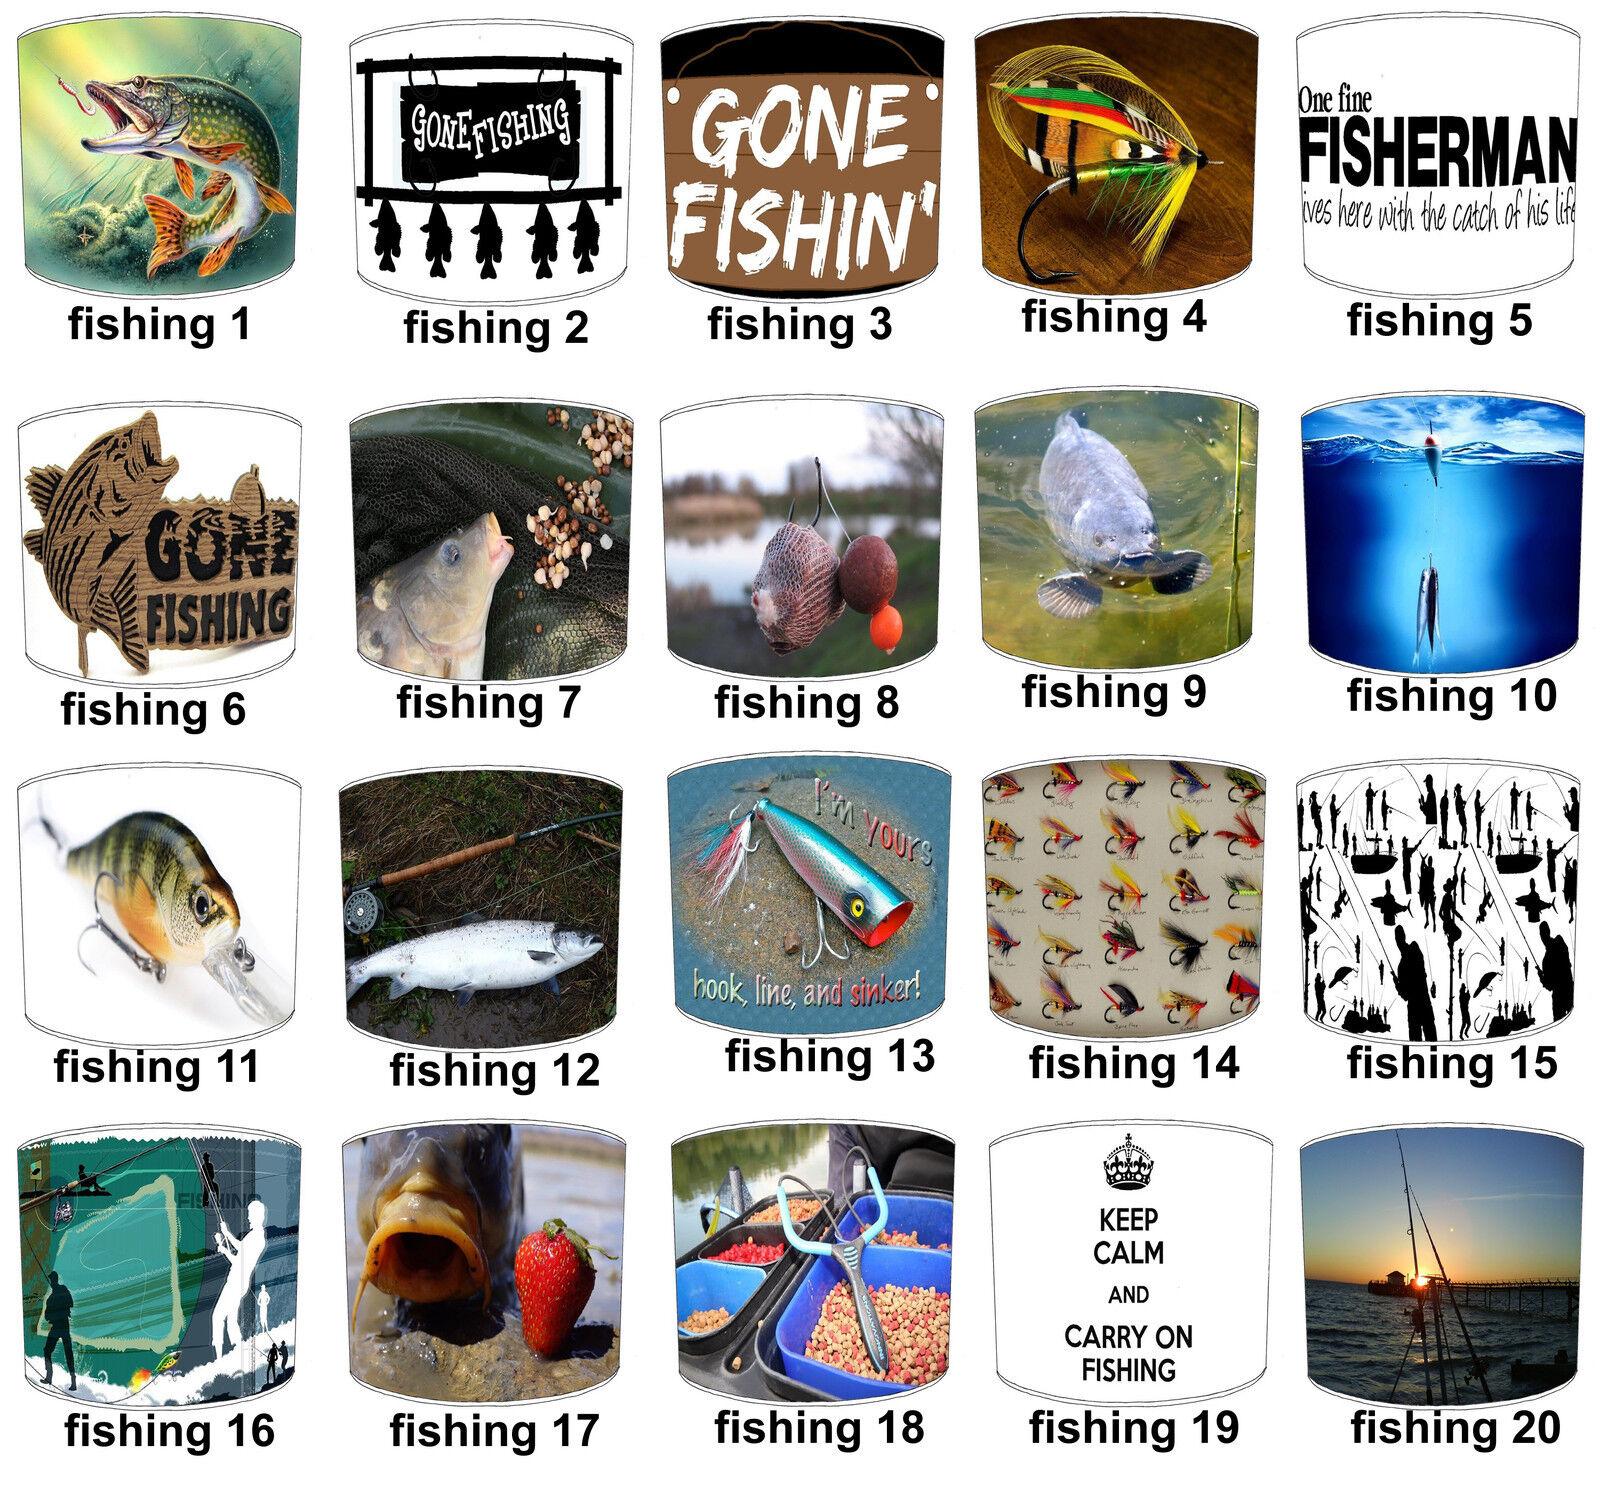 Sea Fishing, Carp Fishing, Fly Fishing, Pike & Course Fishing Designs Lampshades